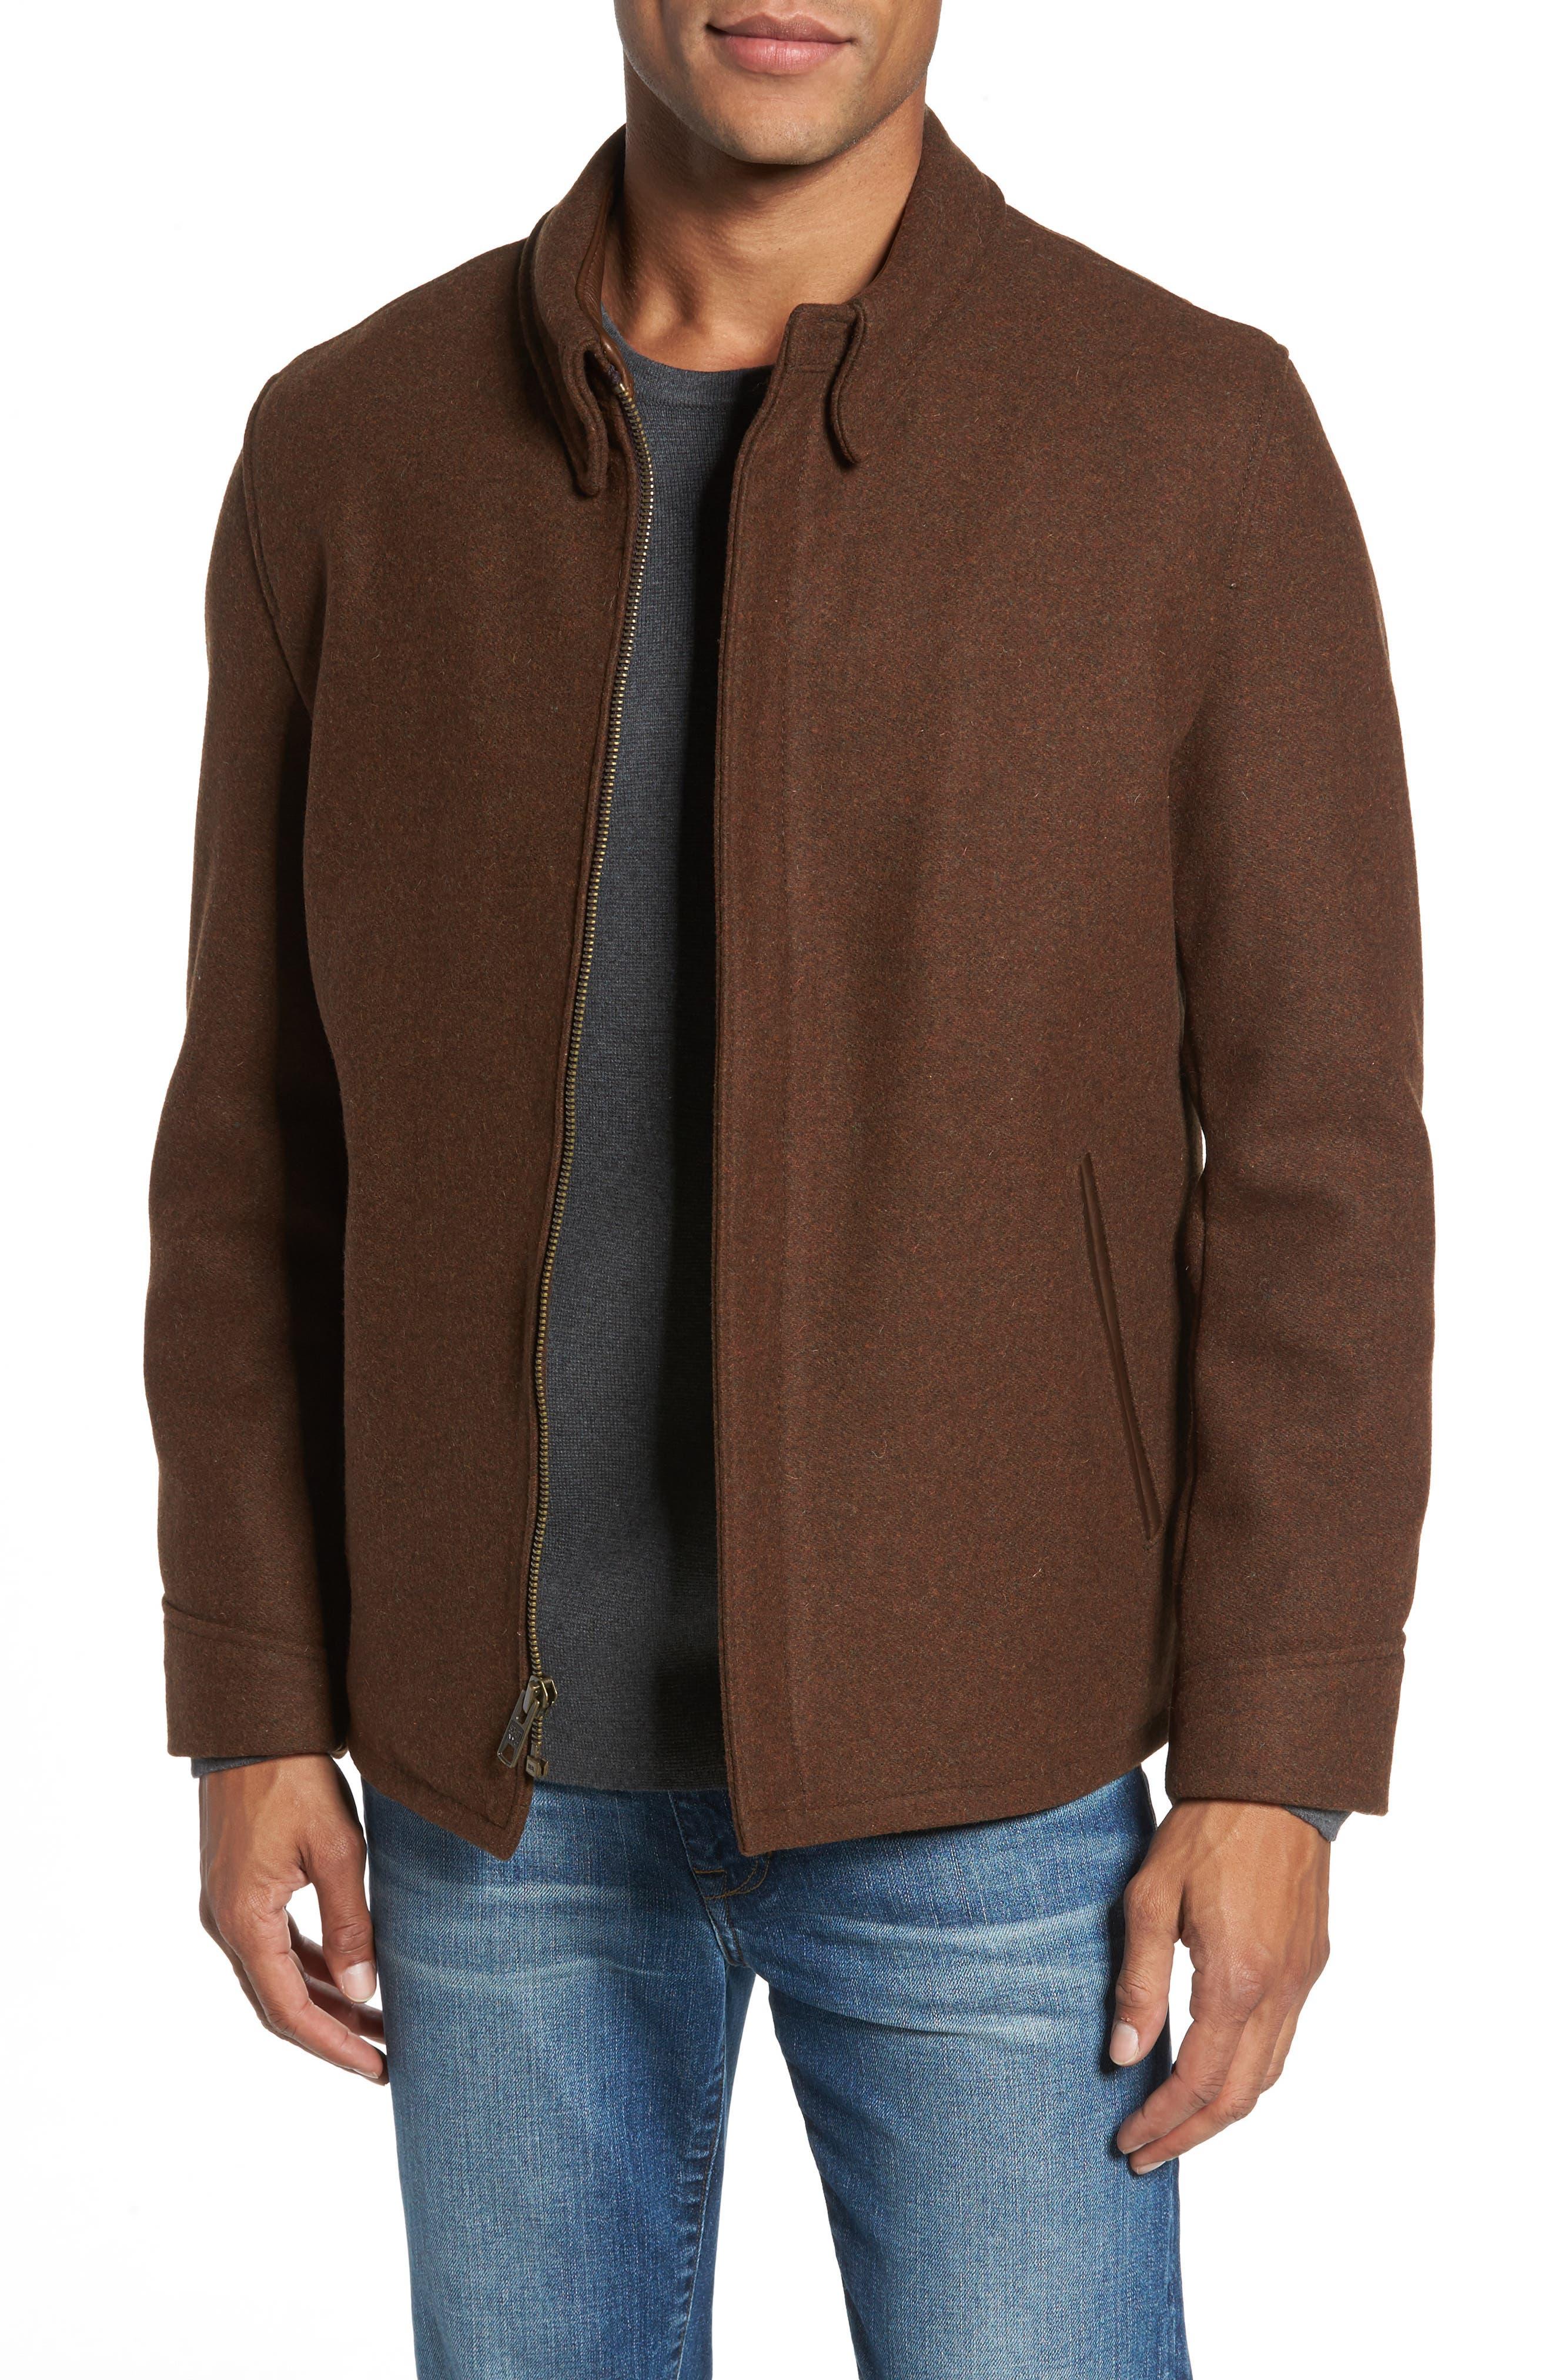 Liberty Wool Blend Zip Front Jacket,                             Main thumbnail 1, color,                             Brown